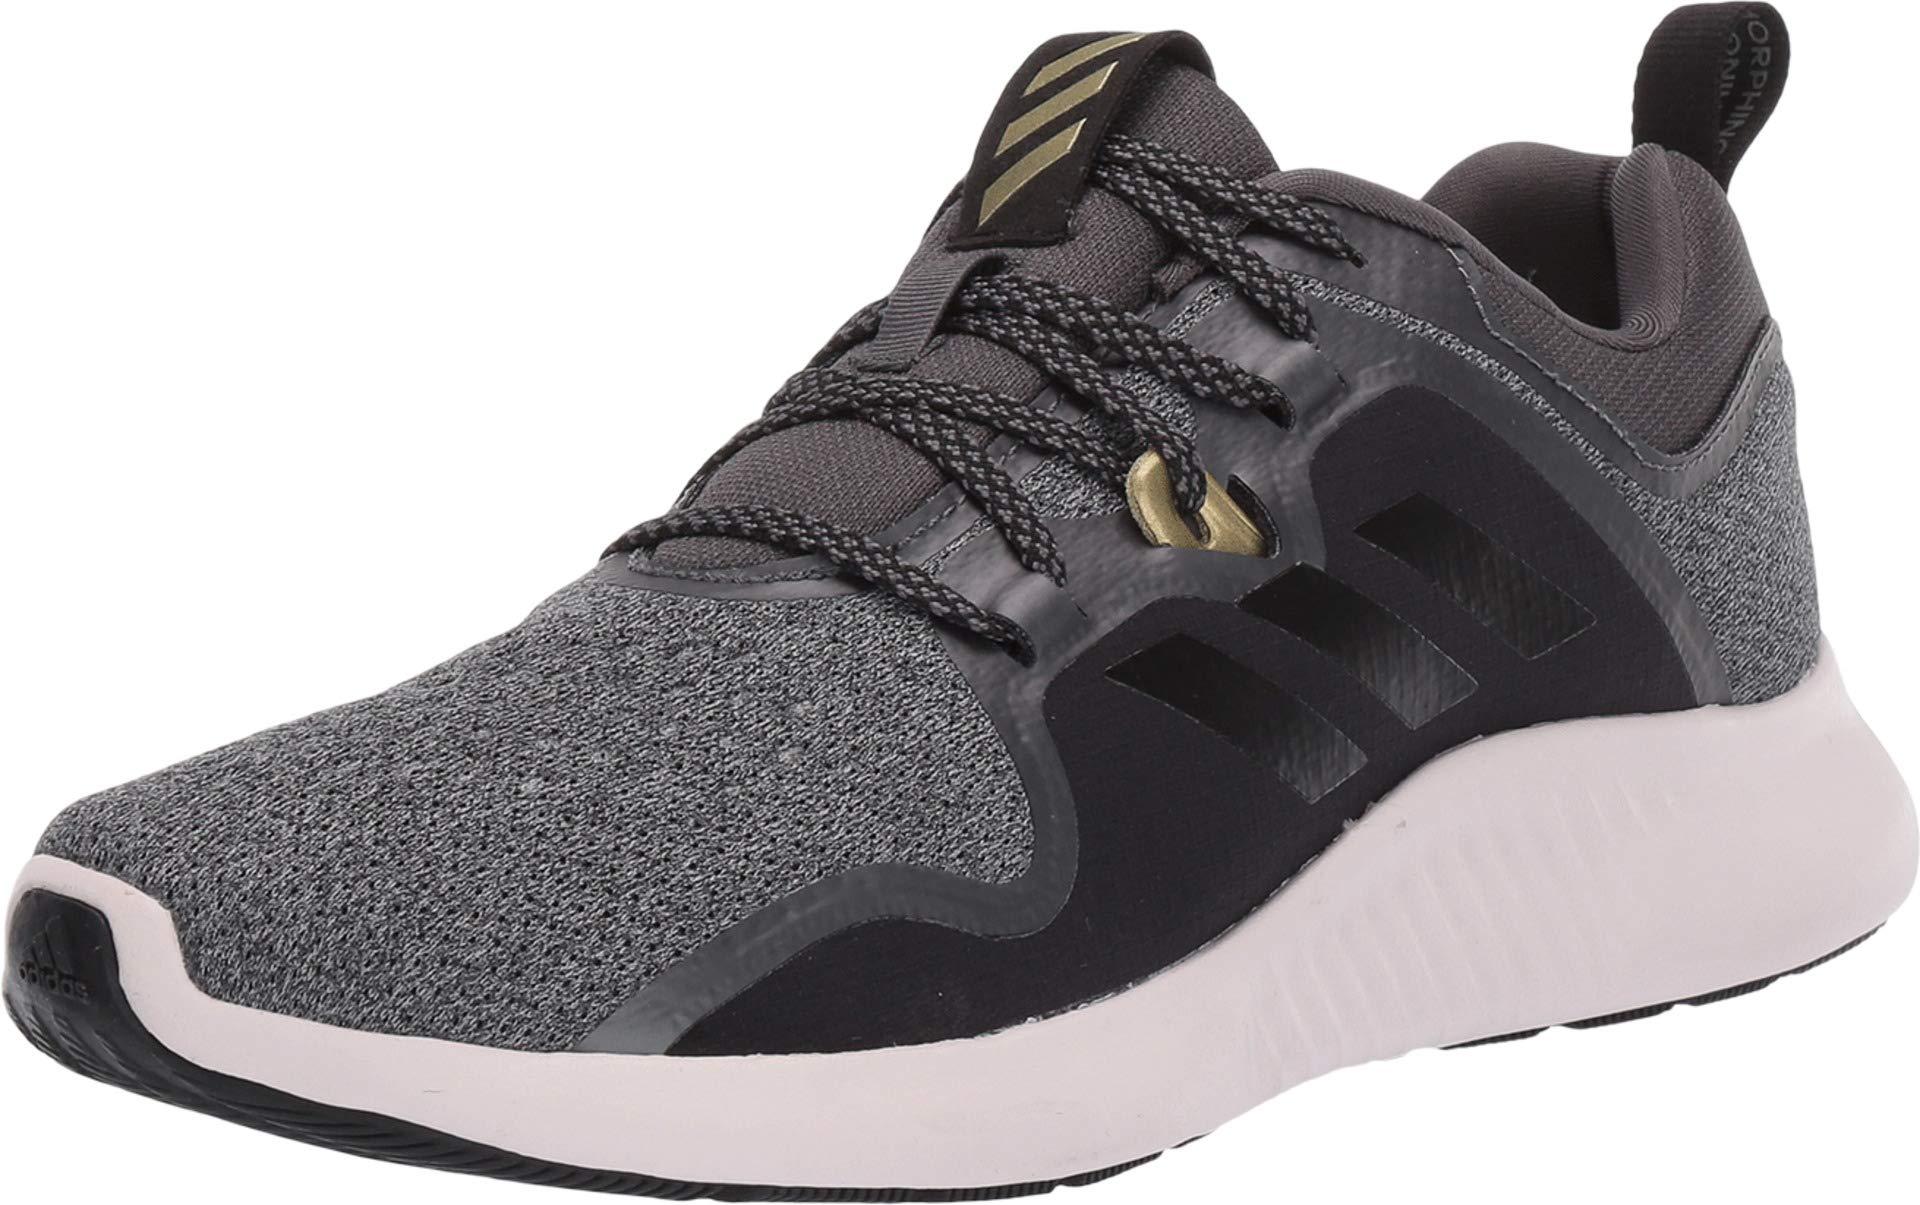 adidas Running Women's Edgebounce Core Black/Core Black 5 B US by adidas (Image #1)